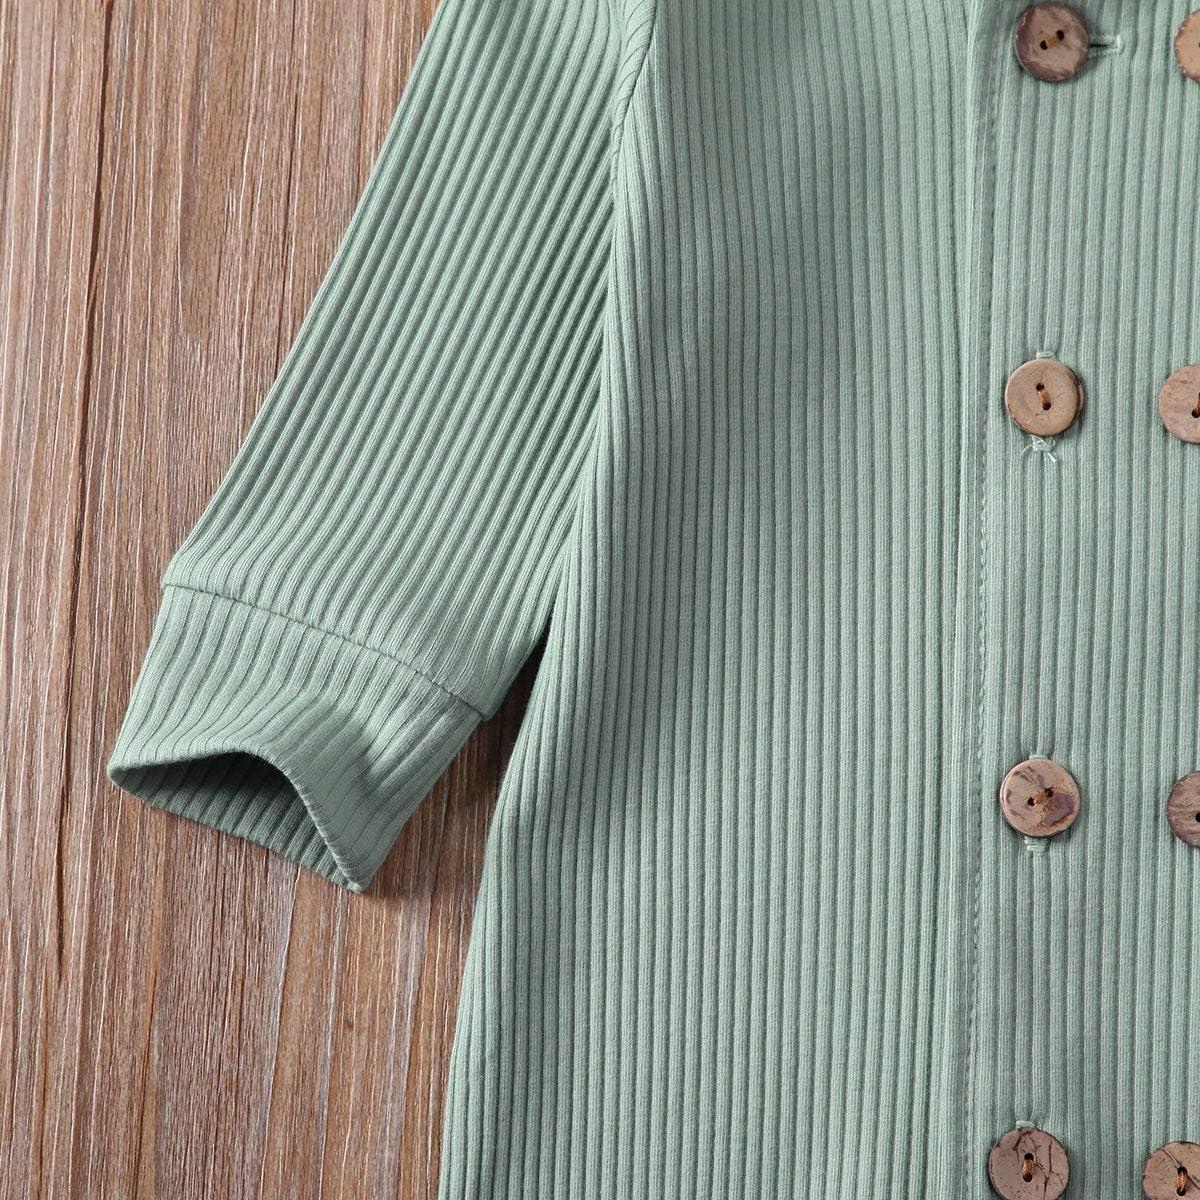 Unisex Baby Girls Boys Long Sleeve Romper Solid Color Bodysuit Jumpsuit Pants Ribbed Pajamas Clothes Set 0-24M